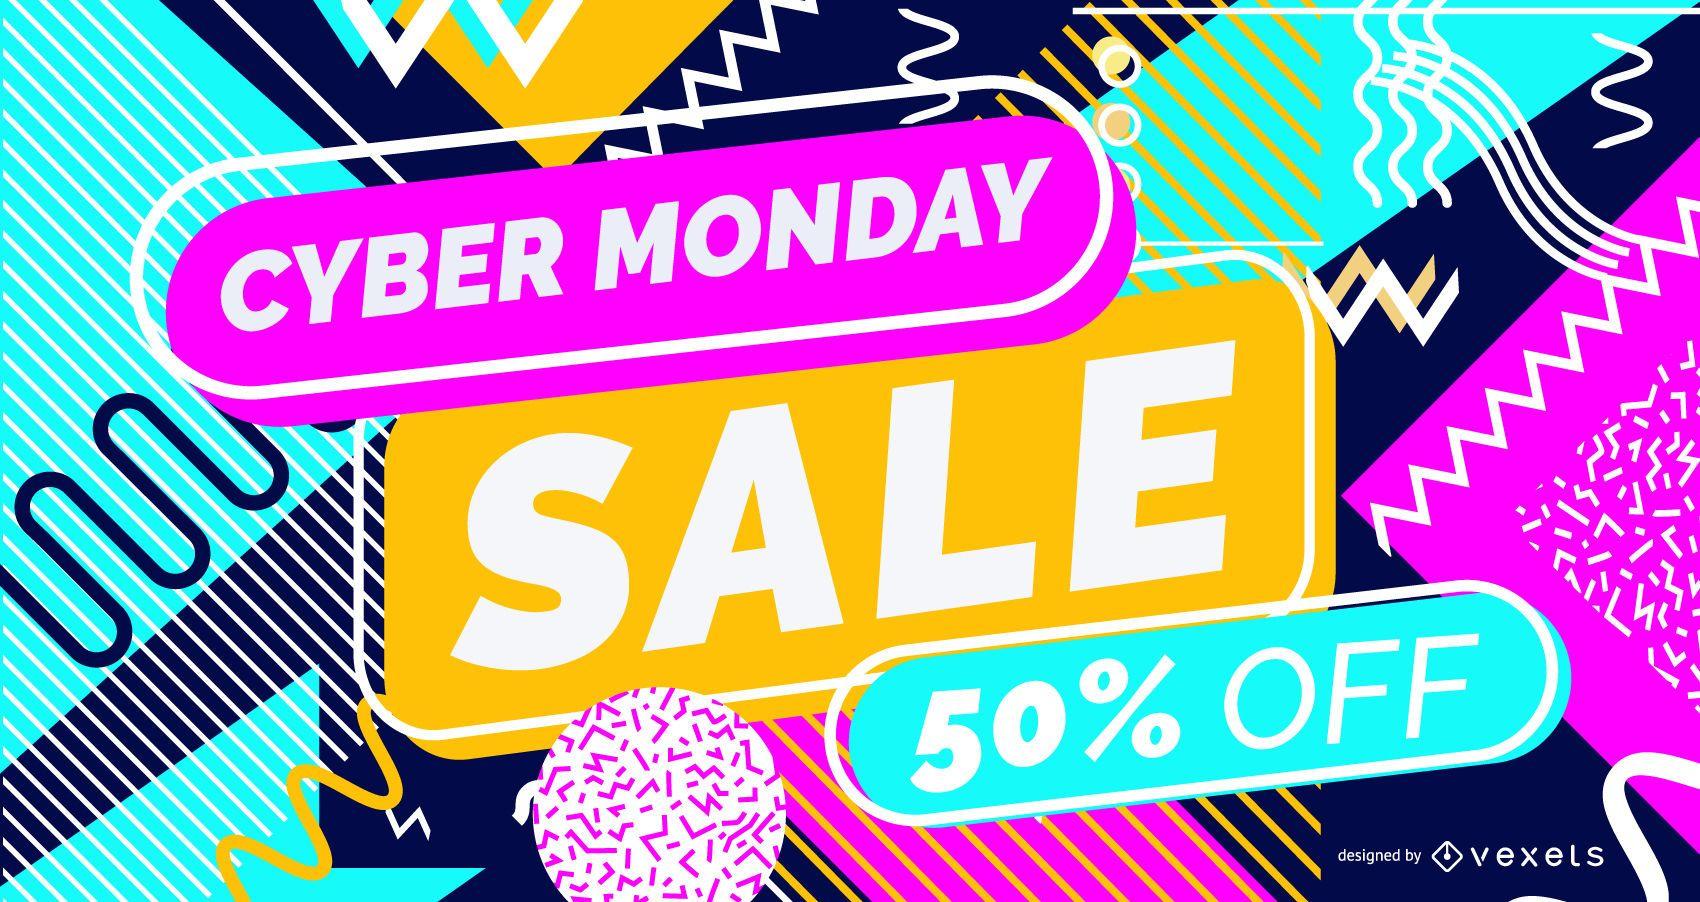 Cyber monday sale slider design